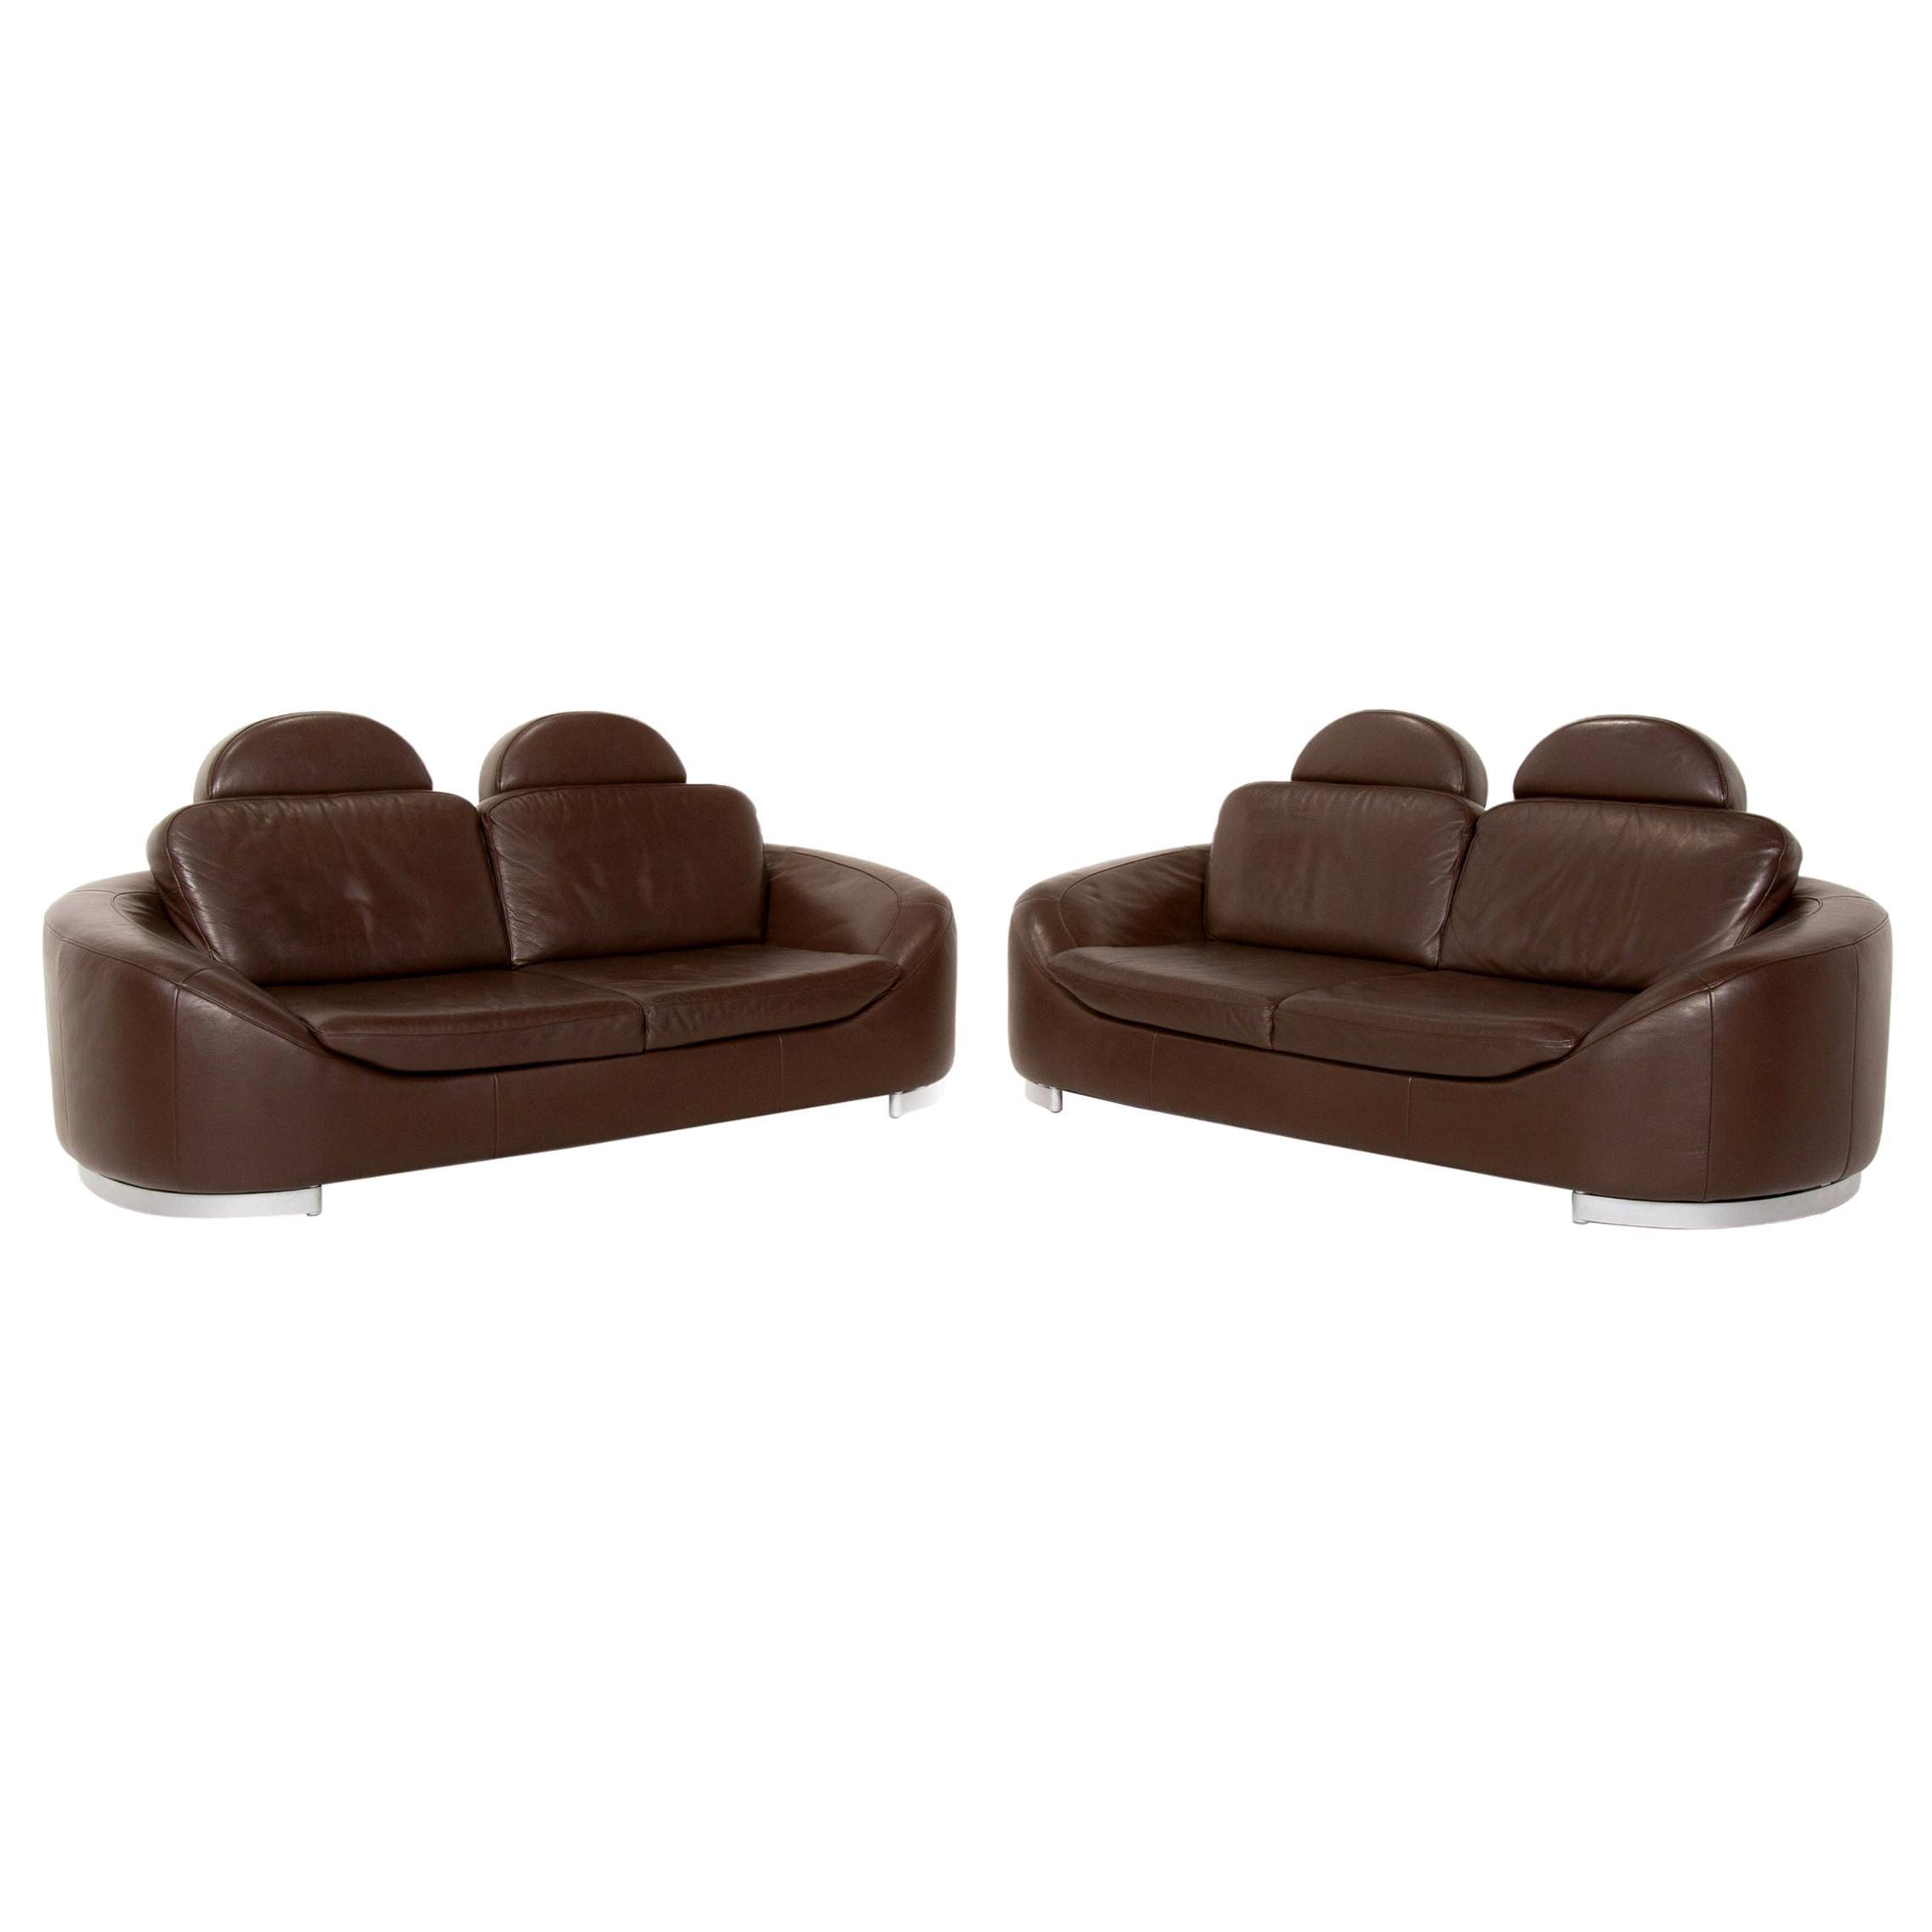 Ewald Schillig Leather Sofa Set Brown Dark Brown 2x Two-Seater